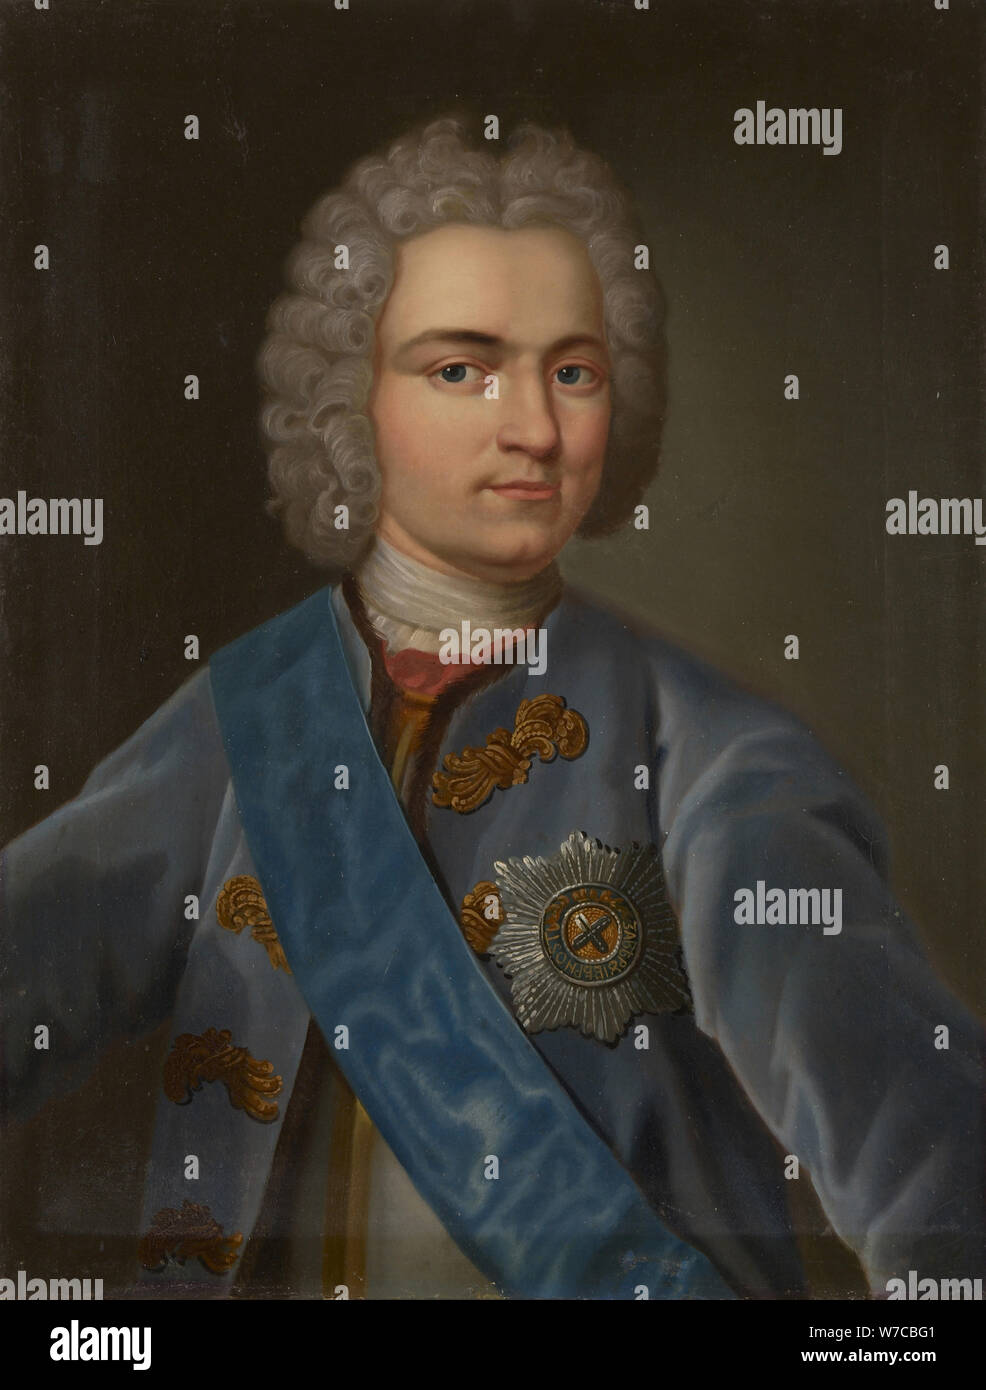 Vladimir Von Stock Photos & Vladimir Von Stock Images - Alamy